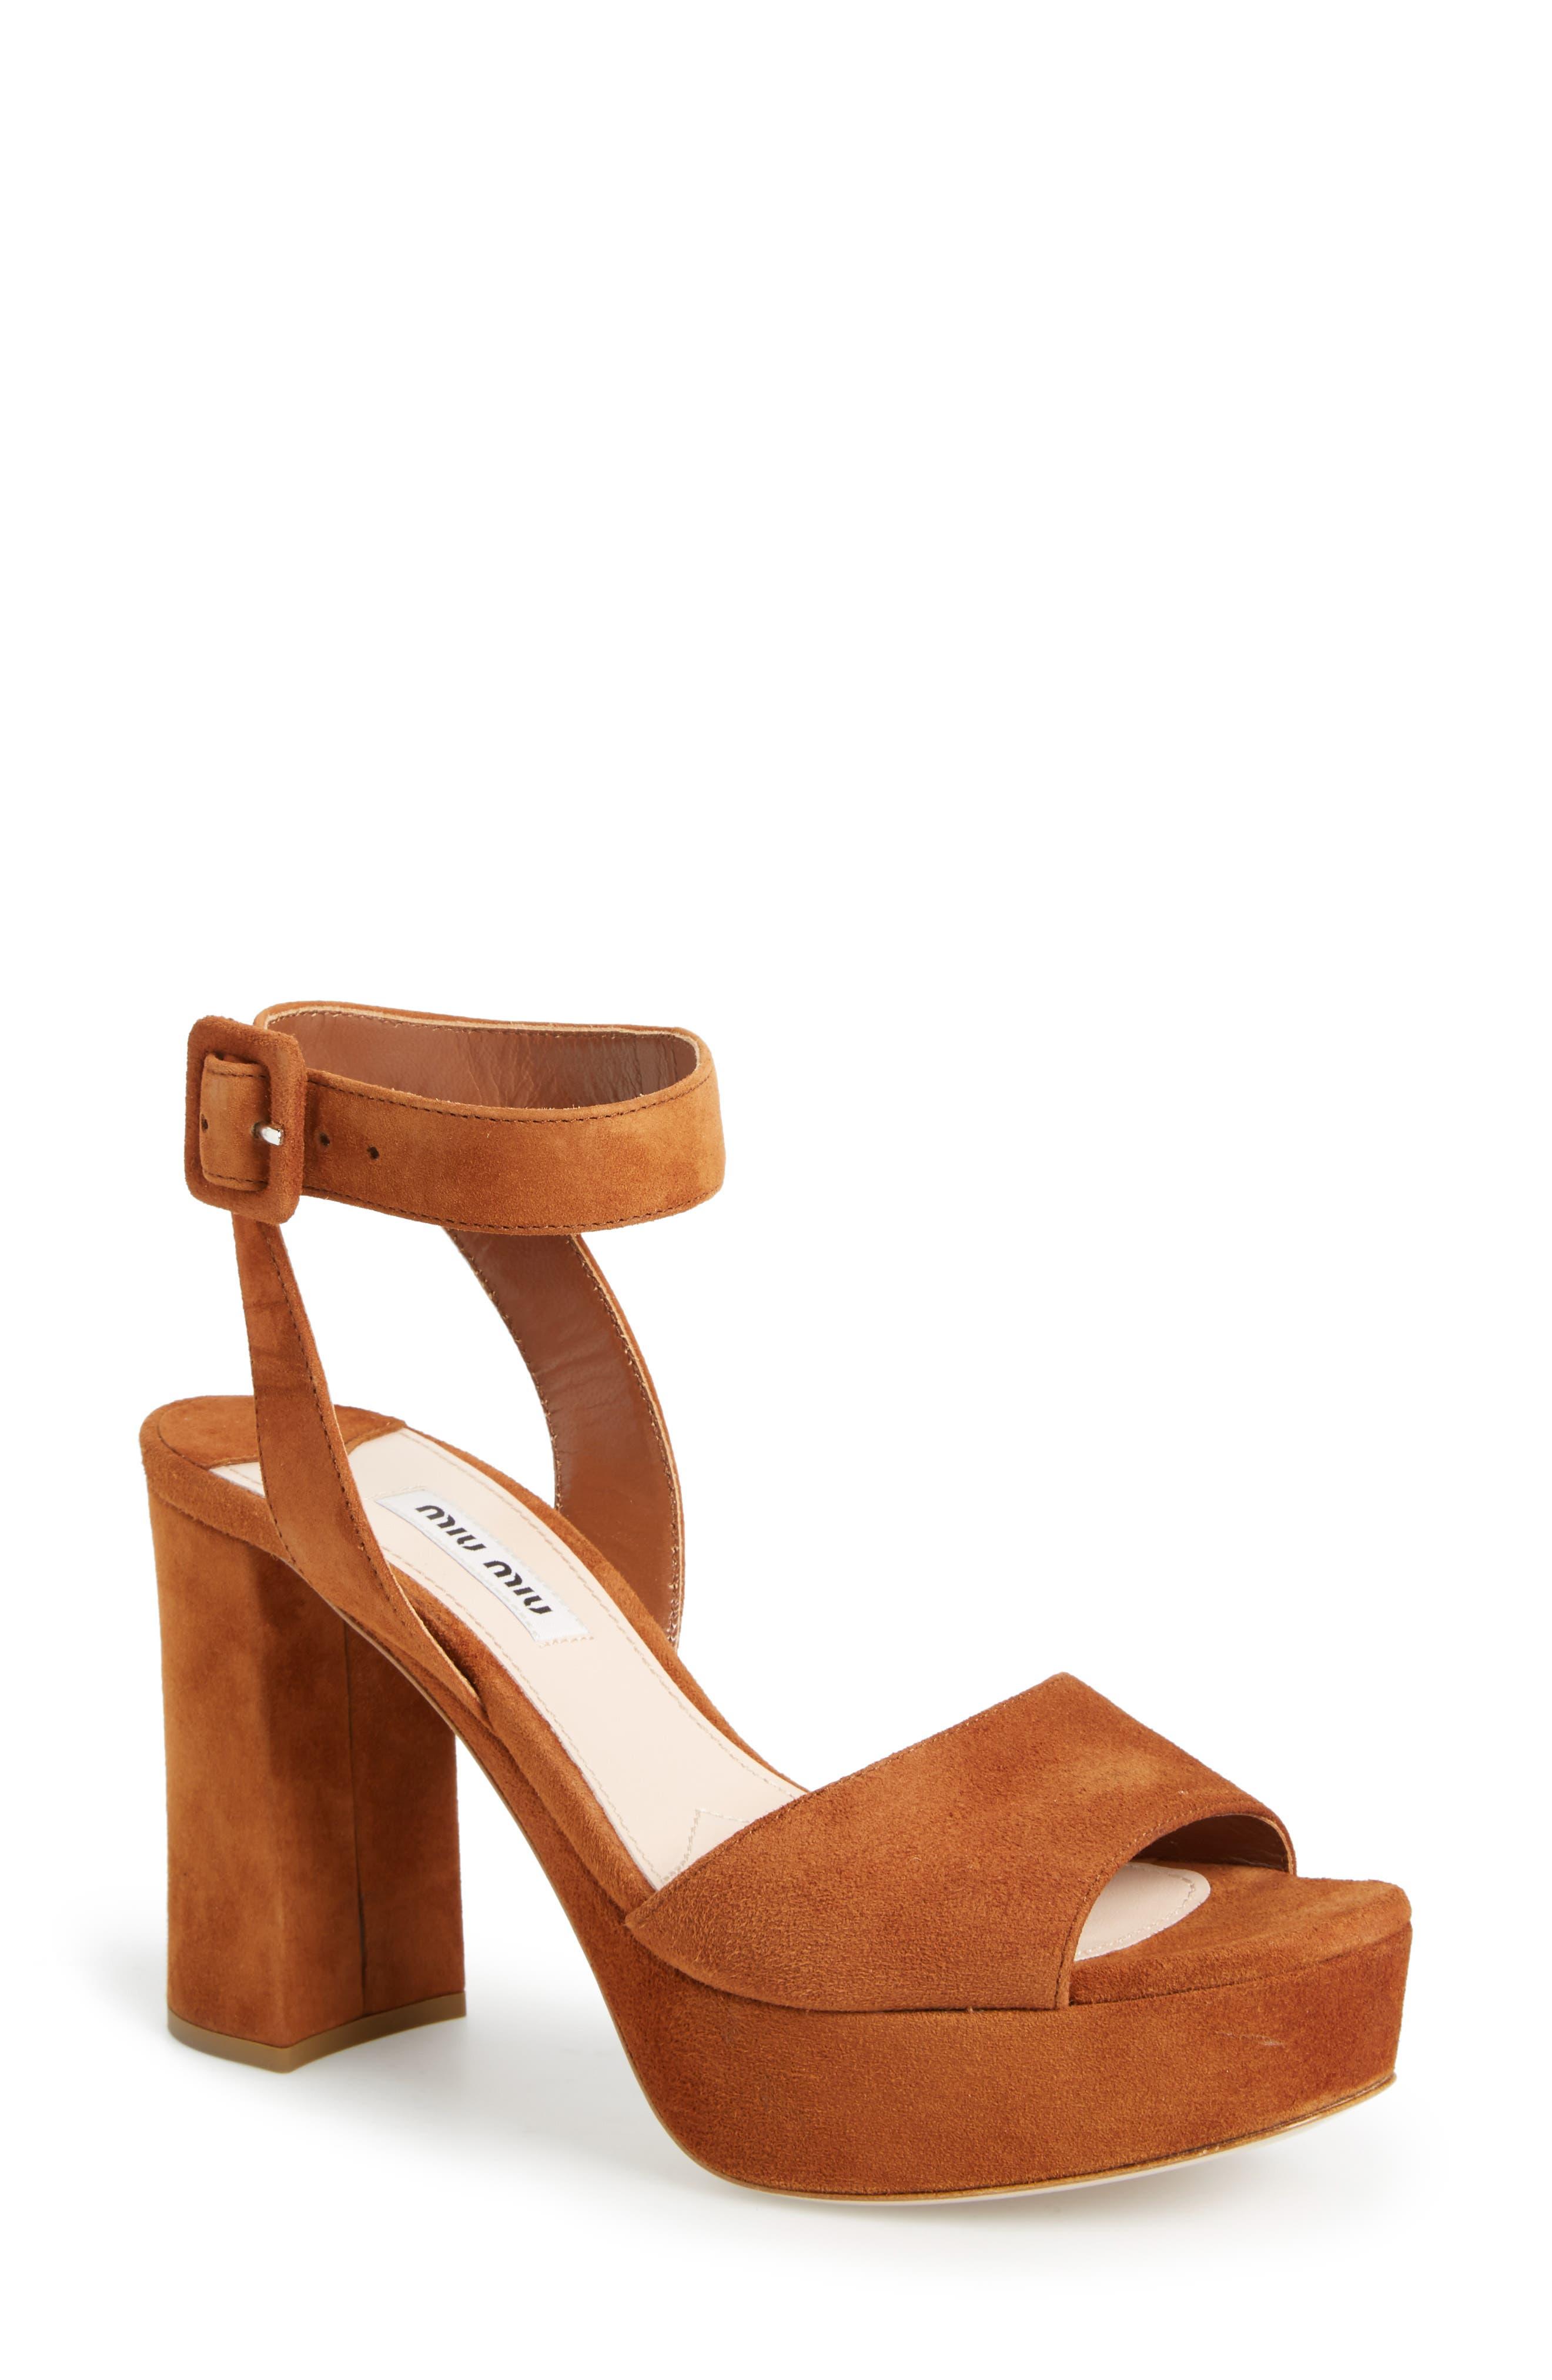 'Sandali' Ankle Strap Sandal,                             Alternate thumbnail 13, color,